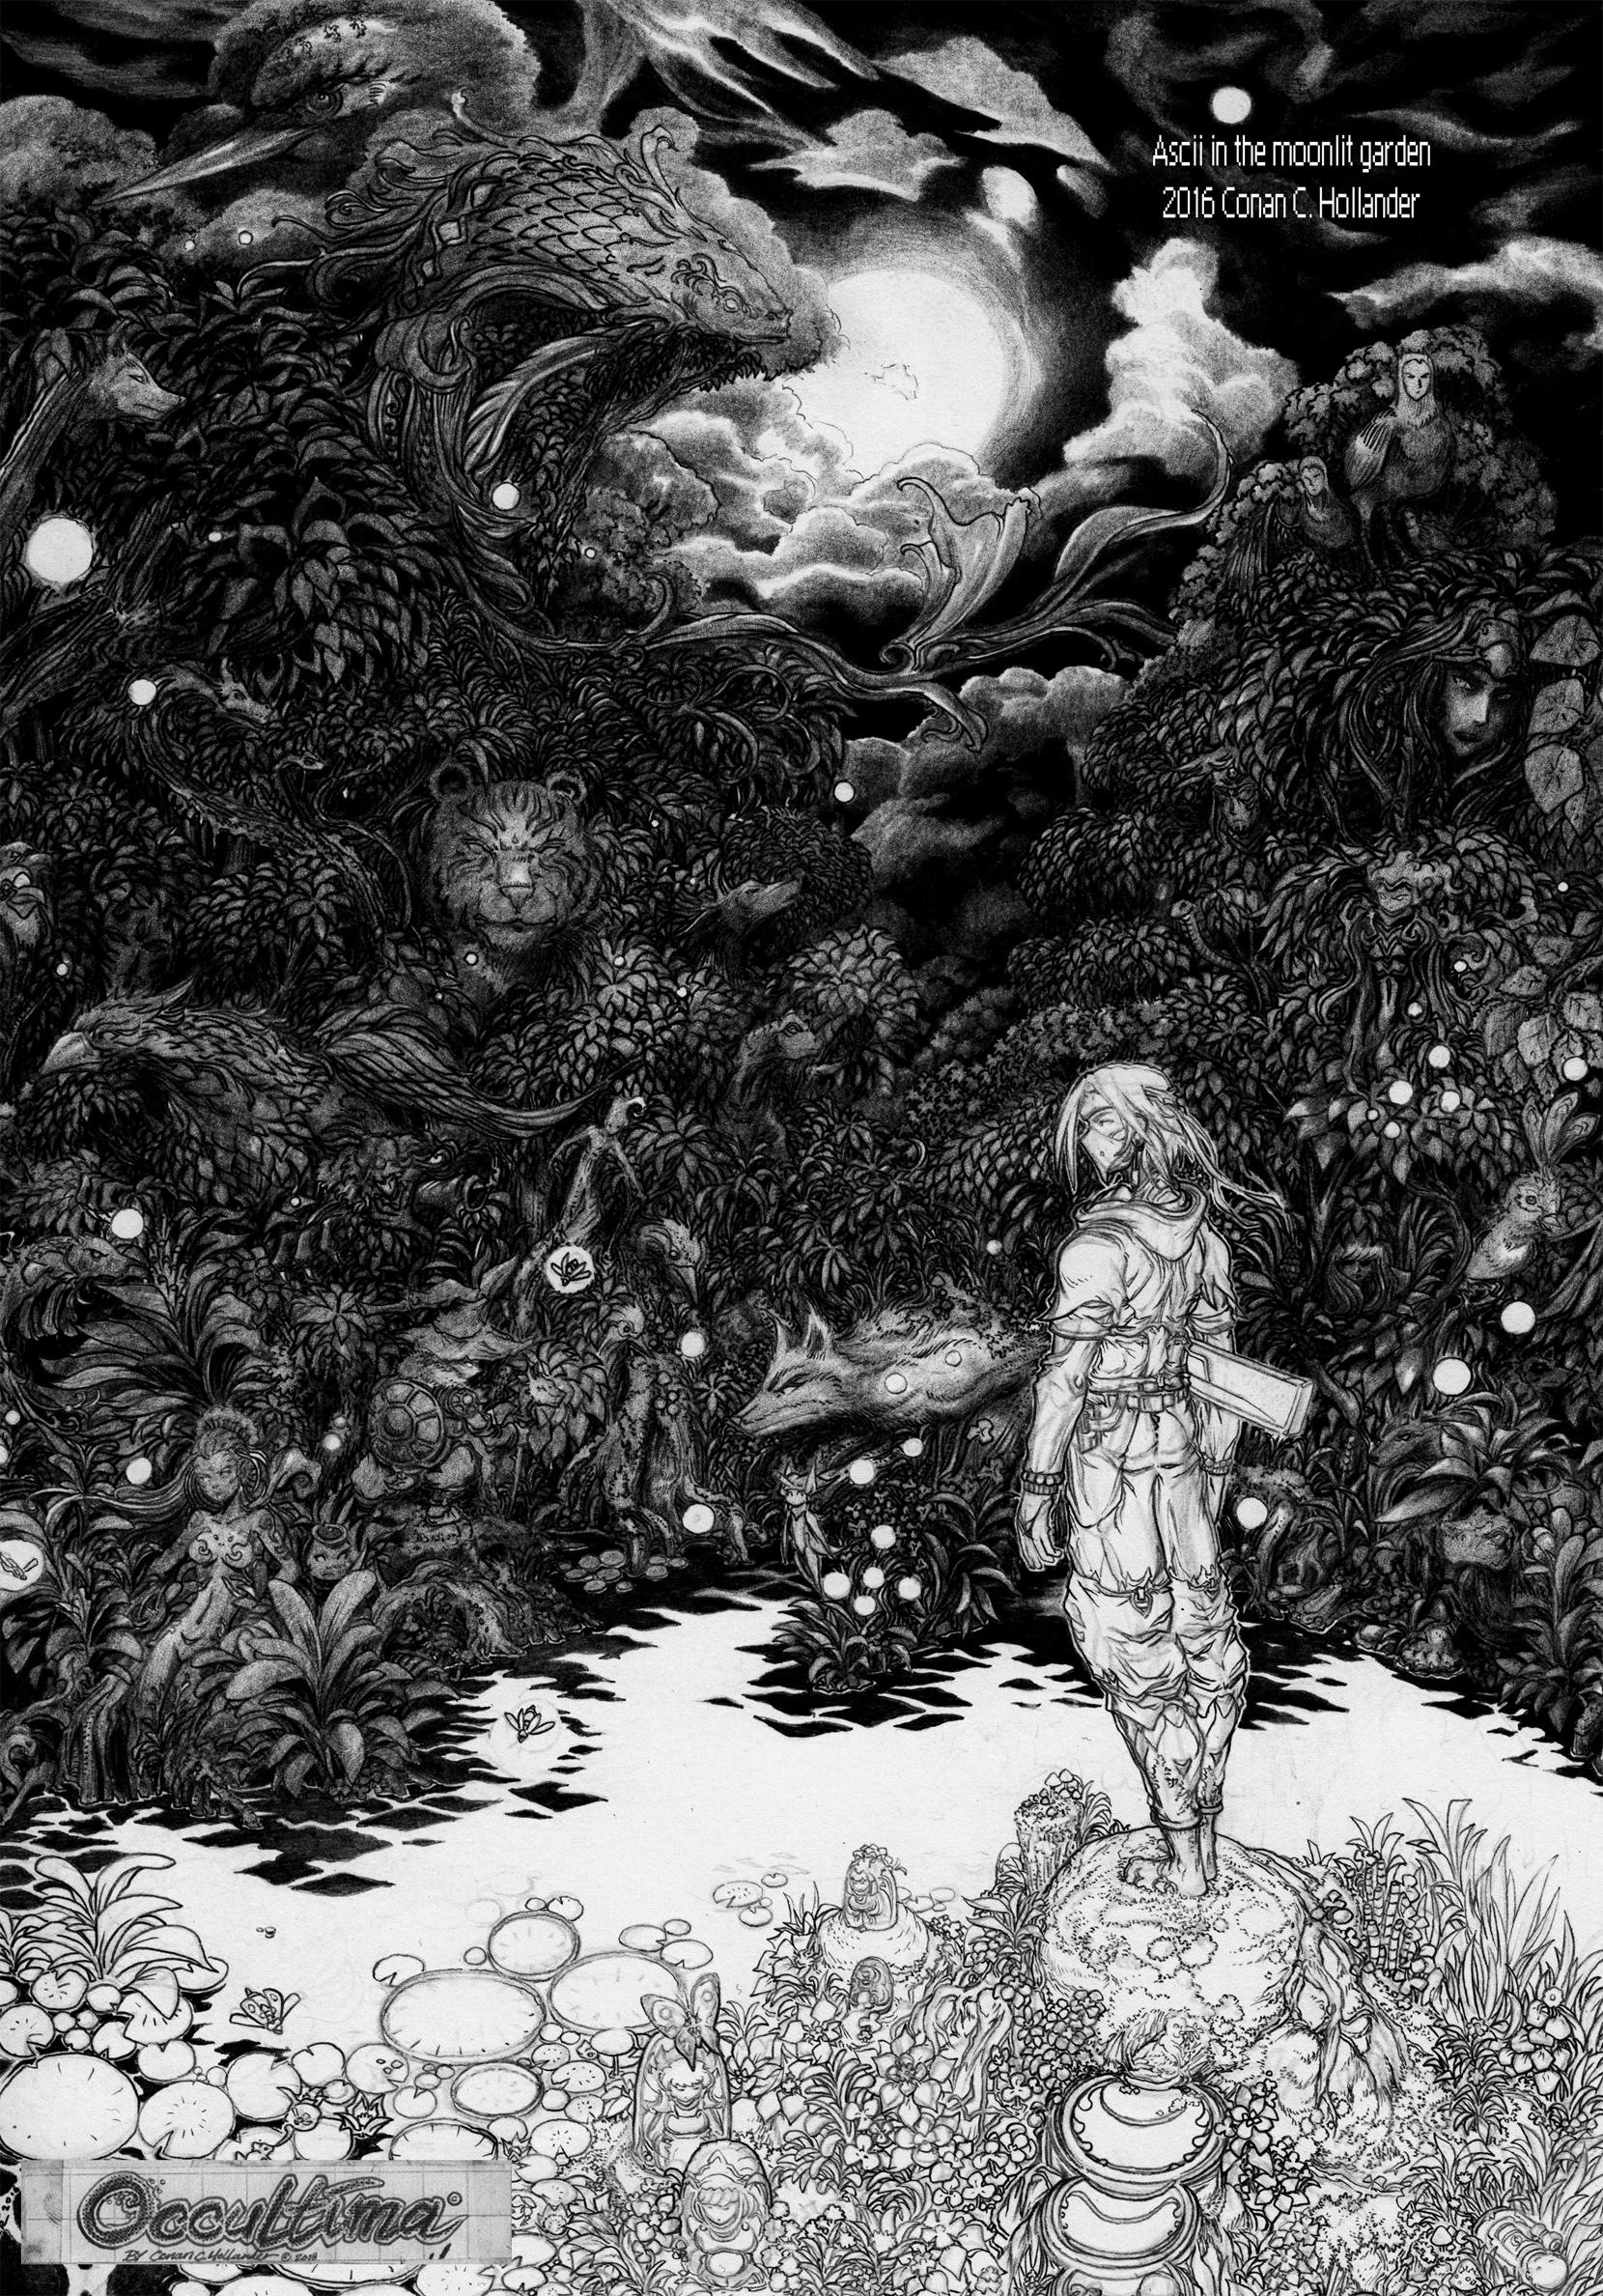 MoonlitGarden © 2016 Conan Hollander